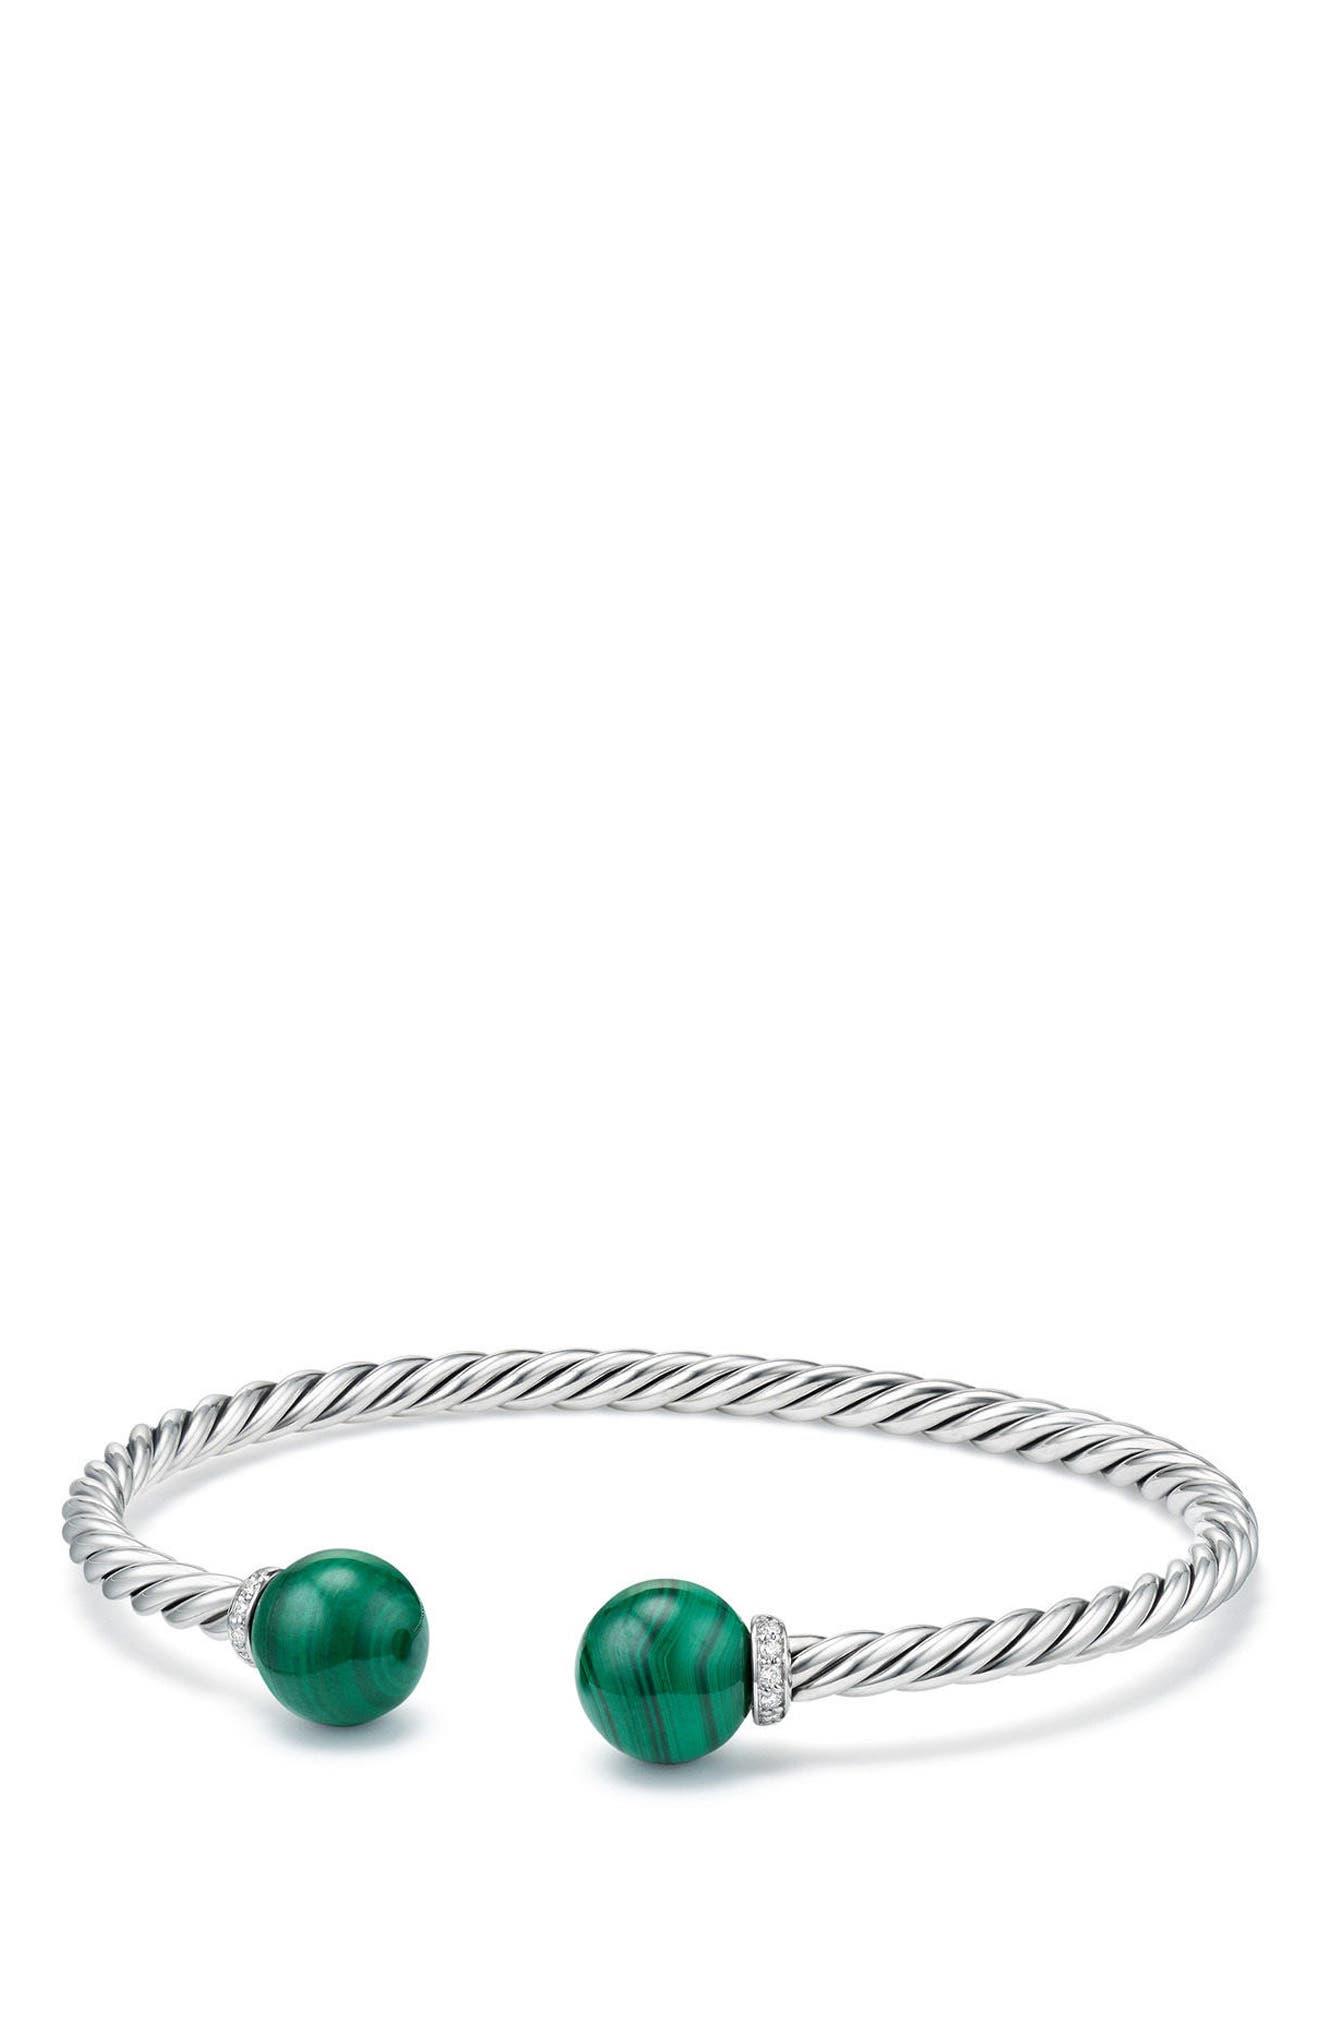 Solari Bead Bracelet with Diamonds,                         Main,                         color, Silver/ Diamond/ Malachite